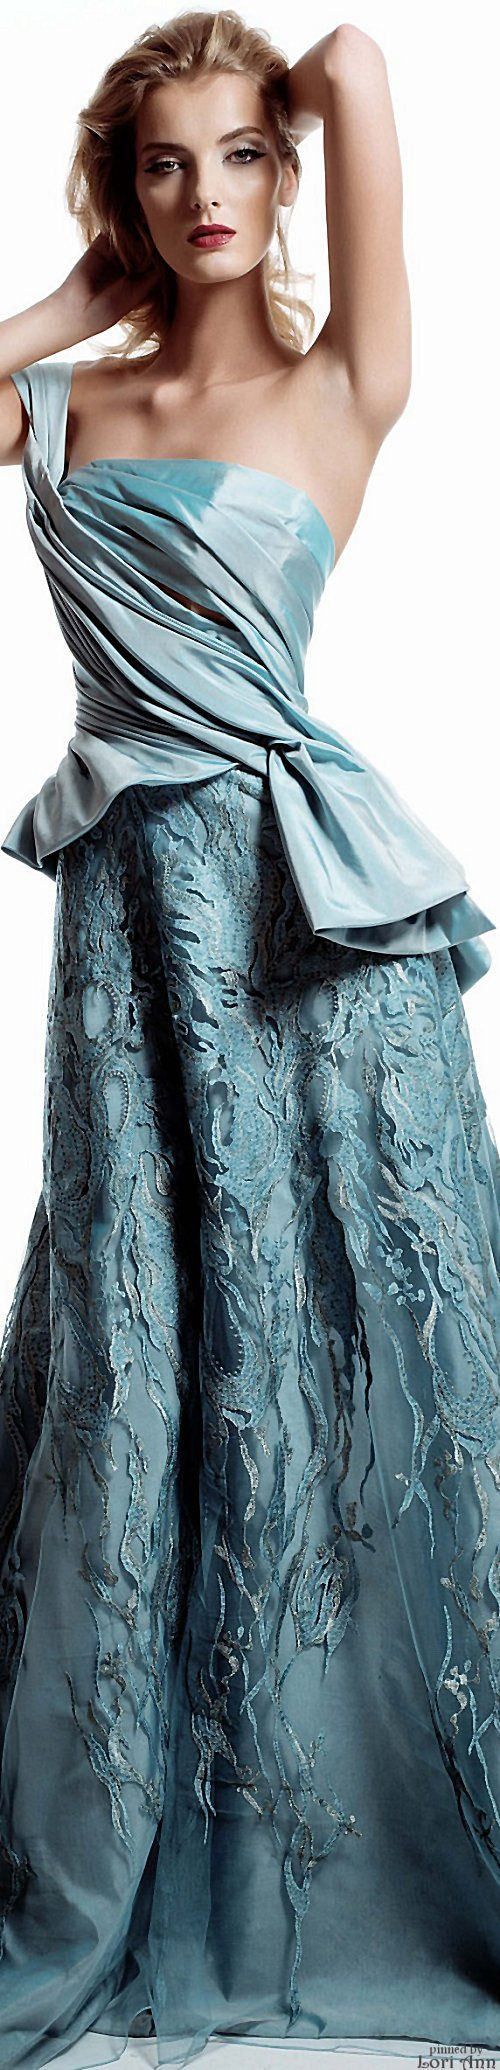 Blanka Matragi Couture Fall 2015 blue maxi dress women fashion outfit clothing style apparel @roressclothes closet ideas